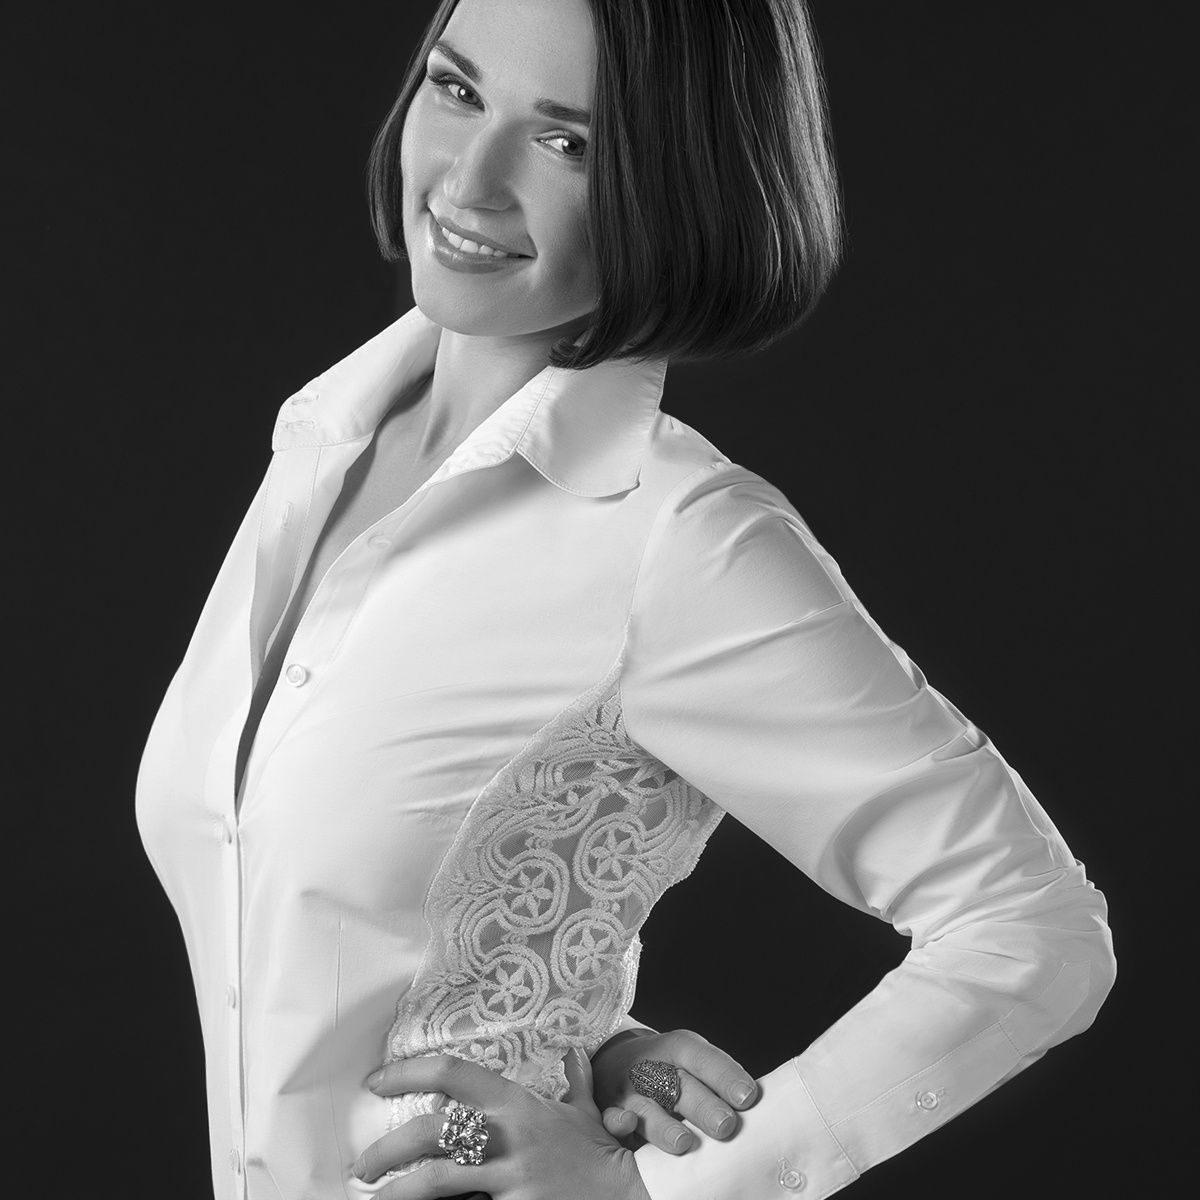 Tetyana Kretova